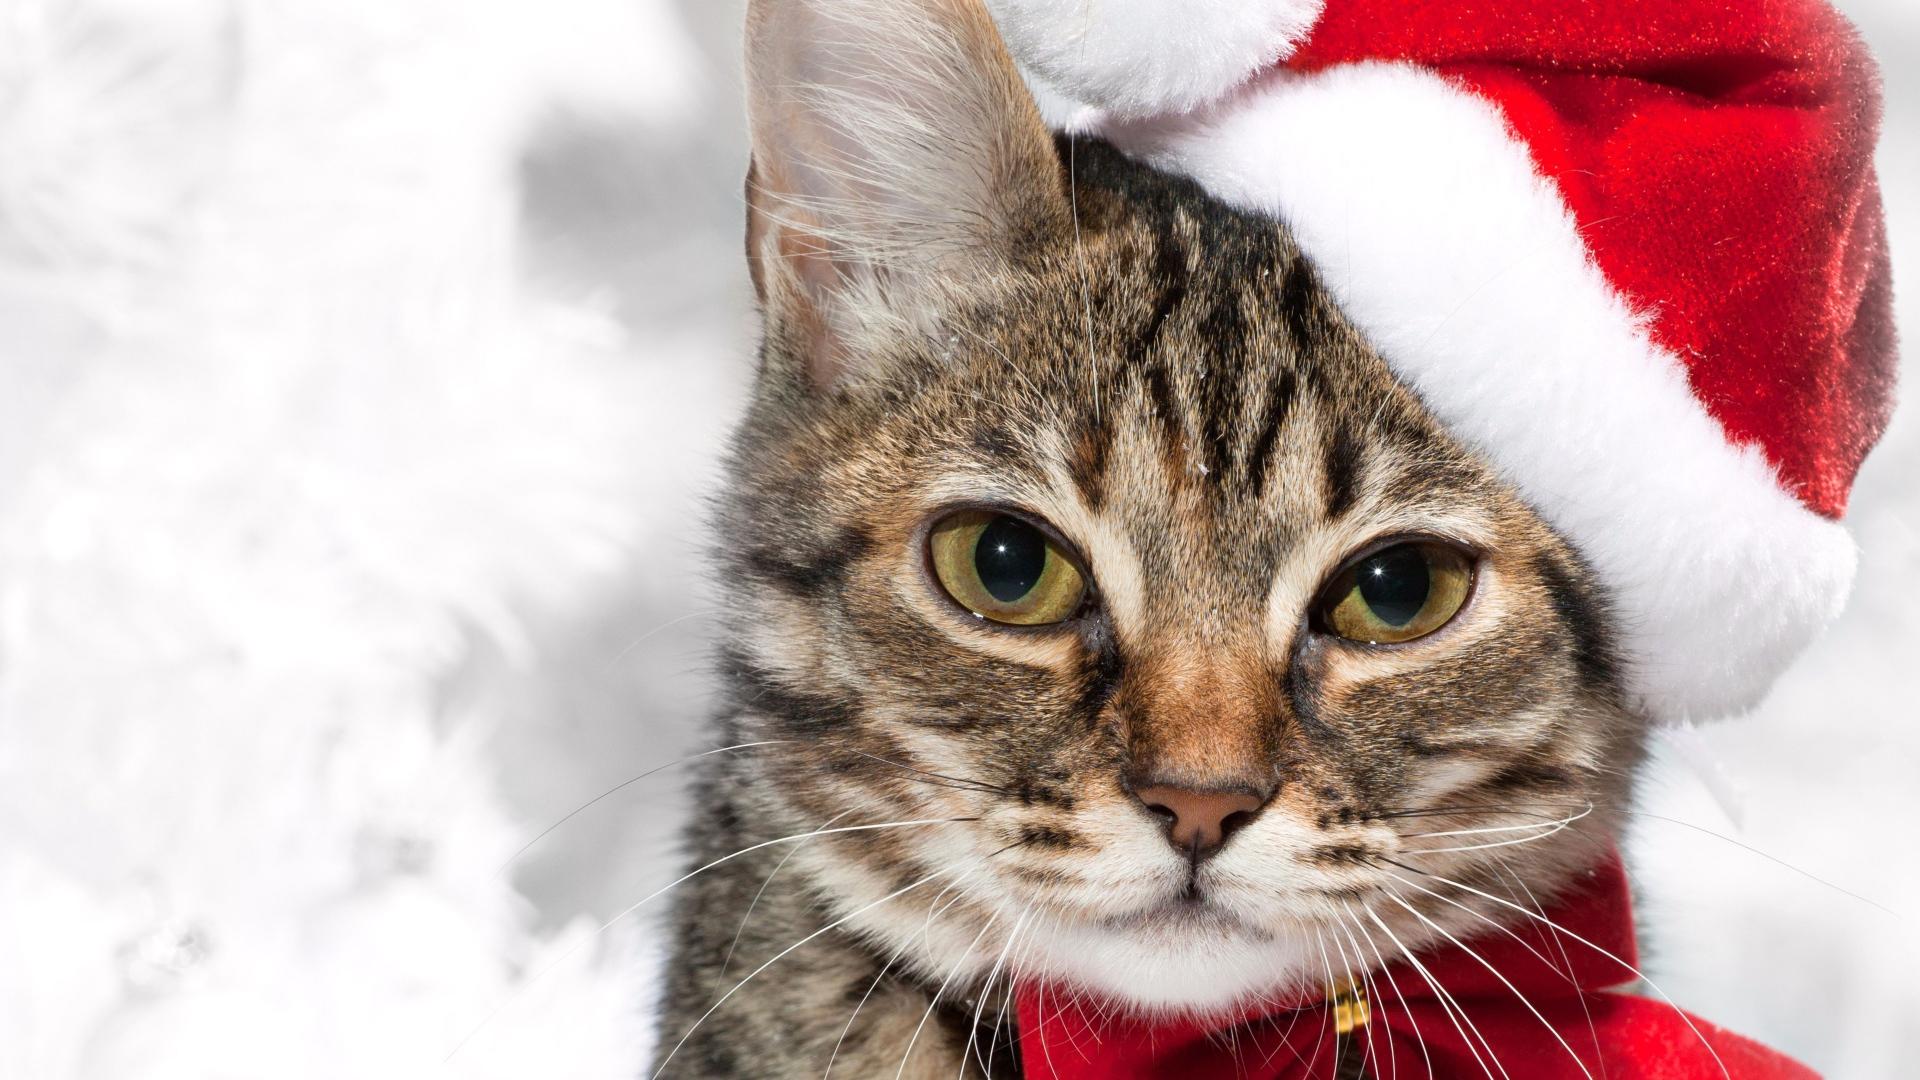 Christmas cat Desktop wallpapers 1920x1080